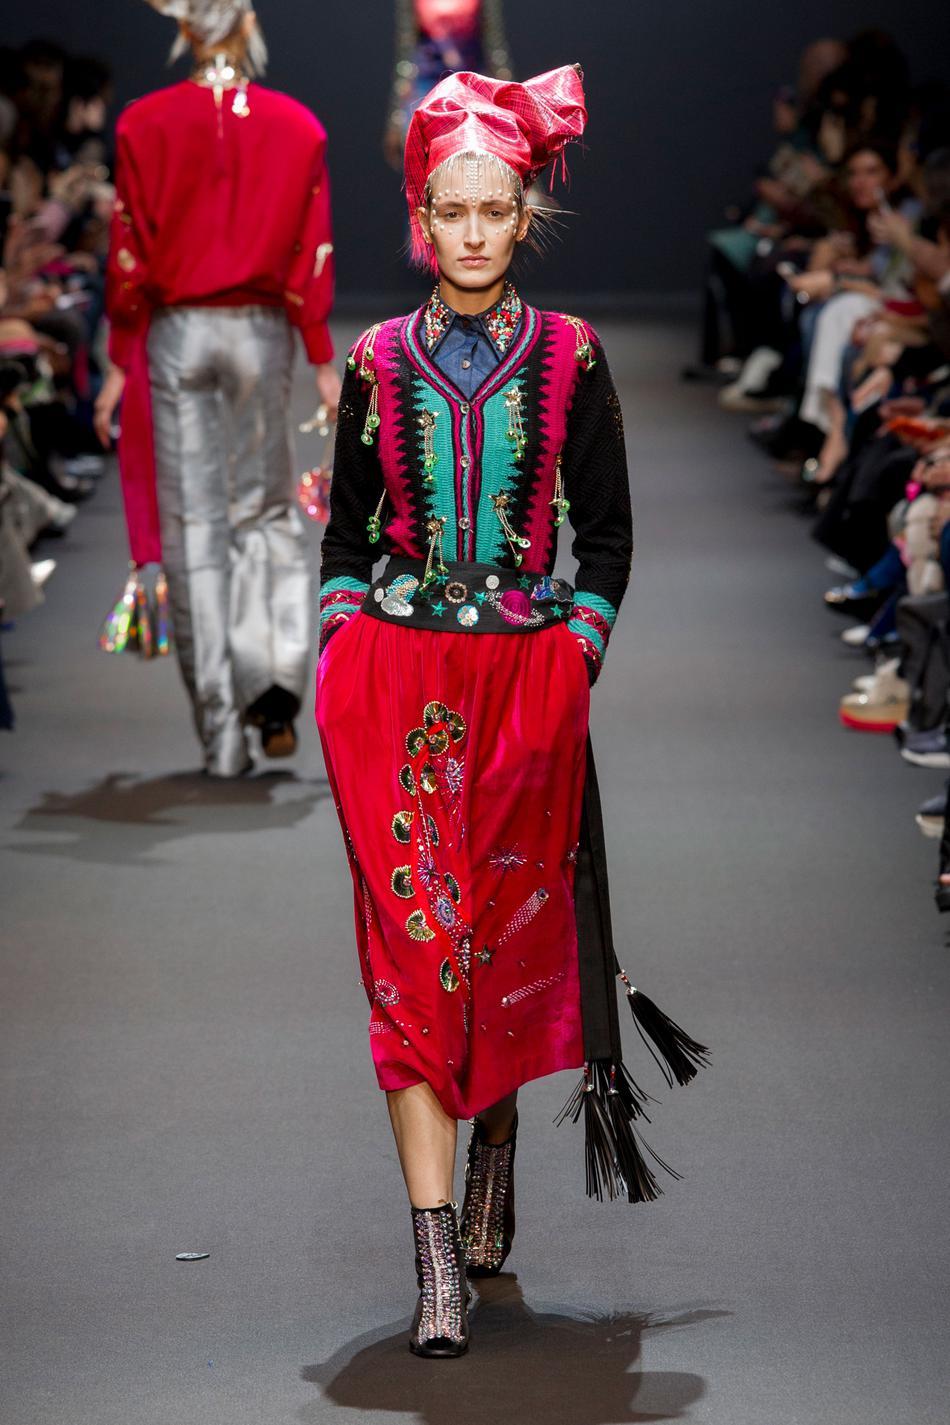 Défilé Manish Arora Fashion Week 2017 - Look 25